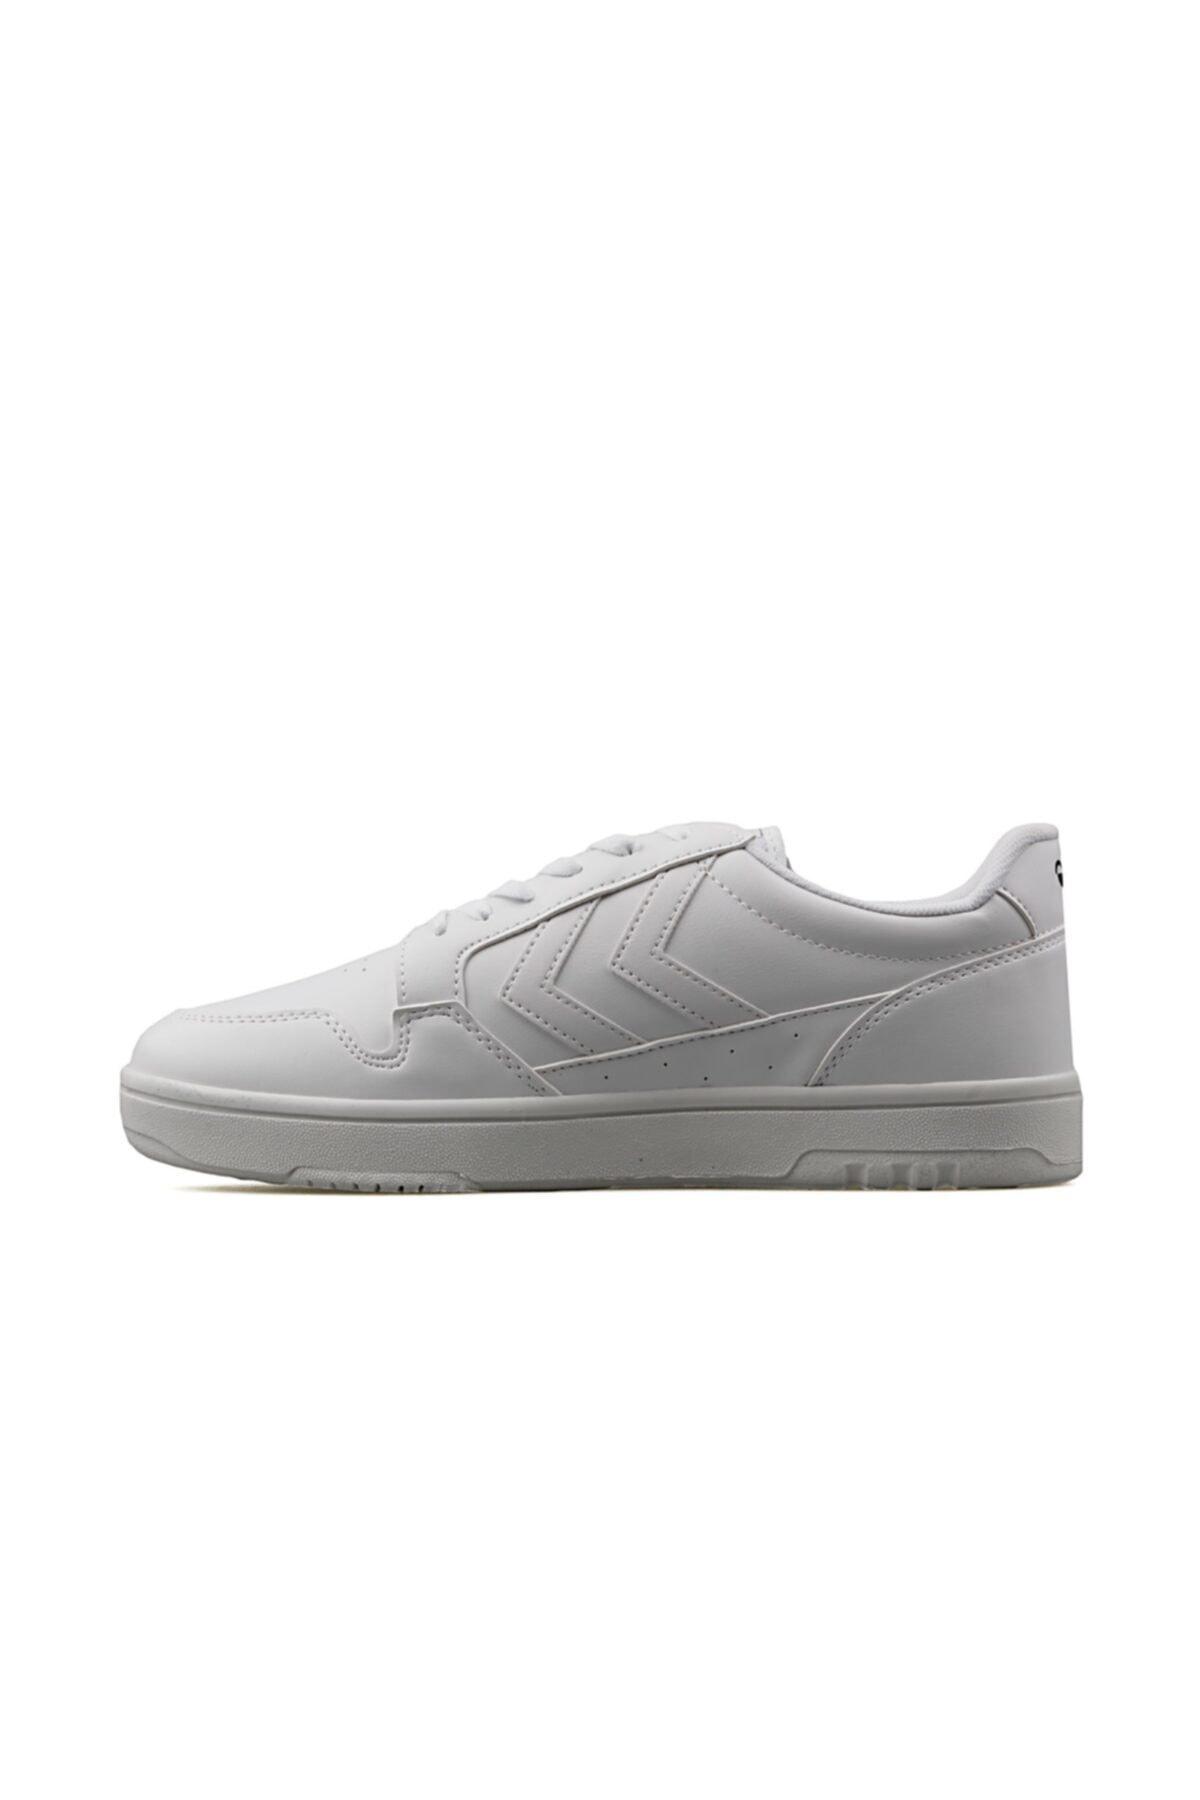 HUMMEL HMLNIELSEN LIFESTYLE SHOE Beyaz Erkek Sneaker Ayakkabı 100550337 2